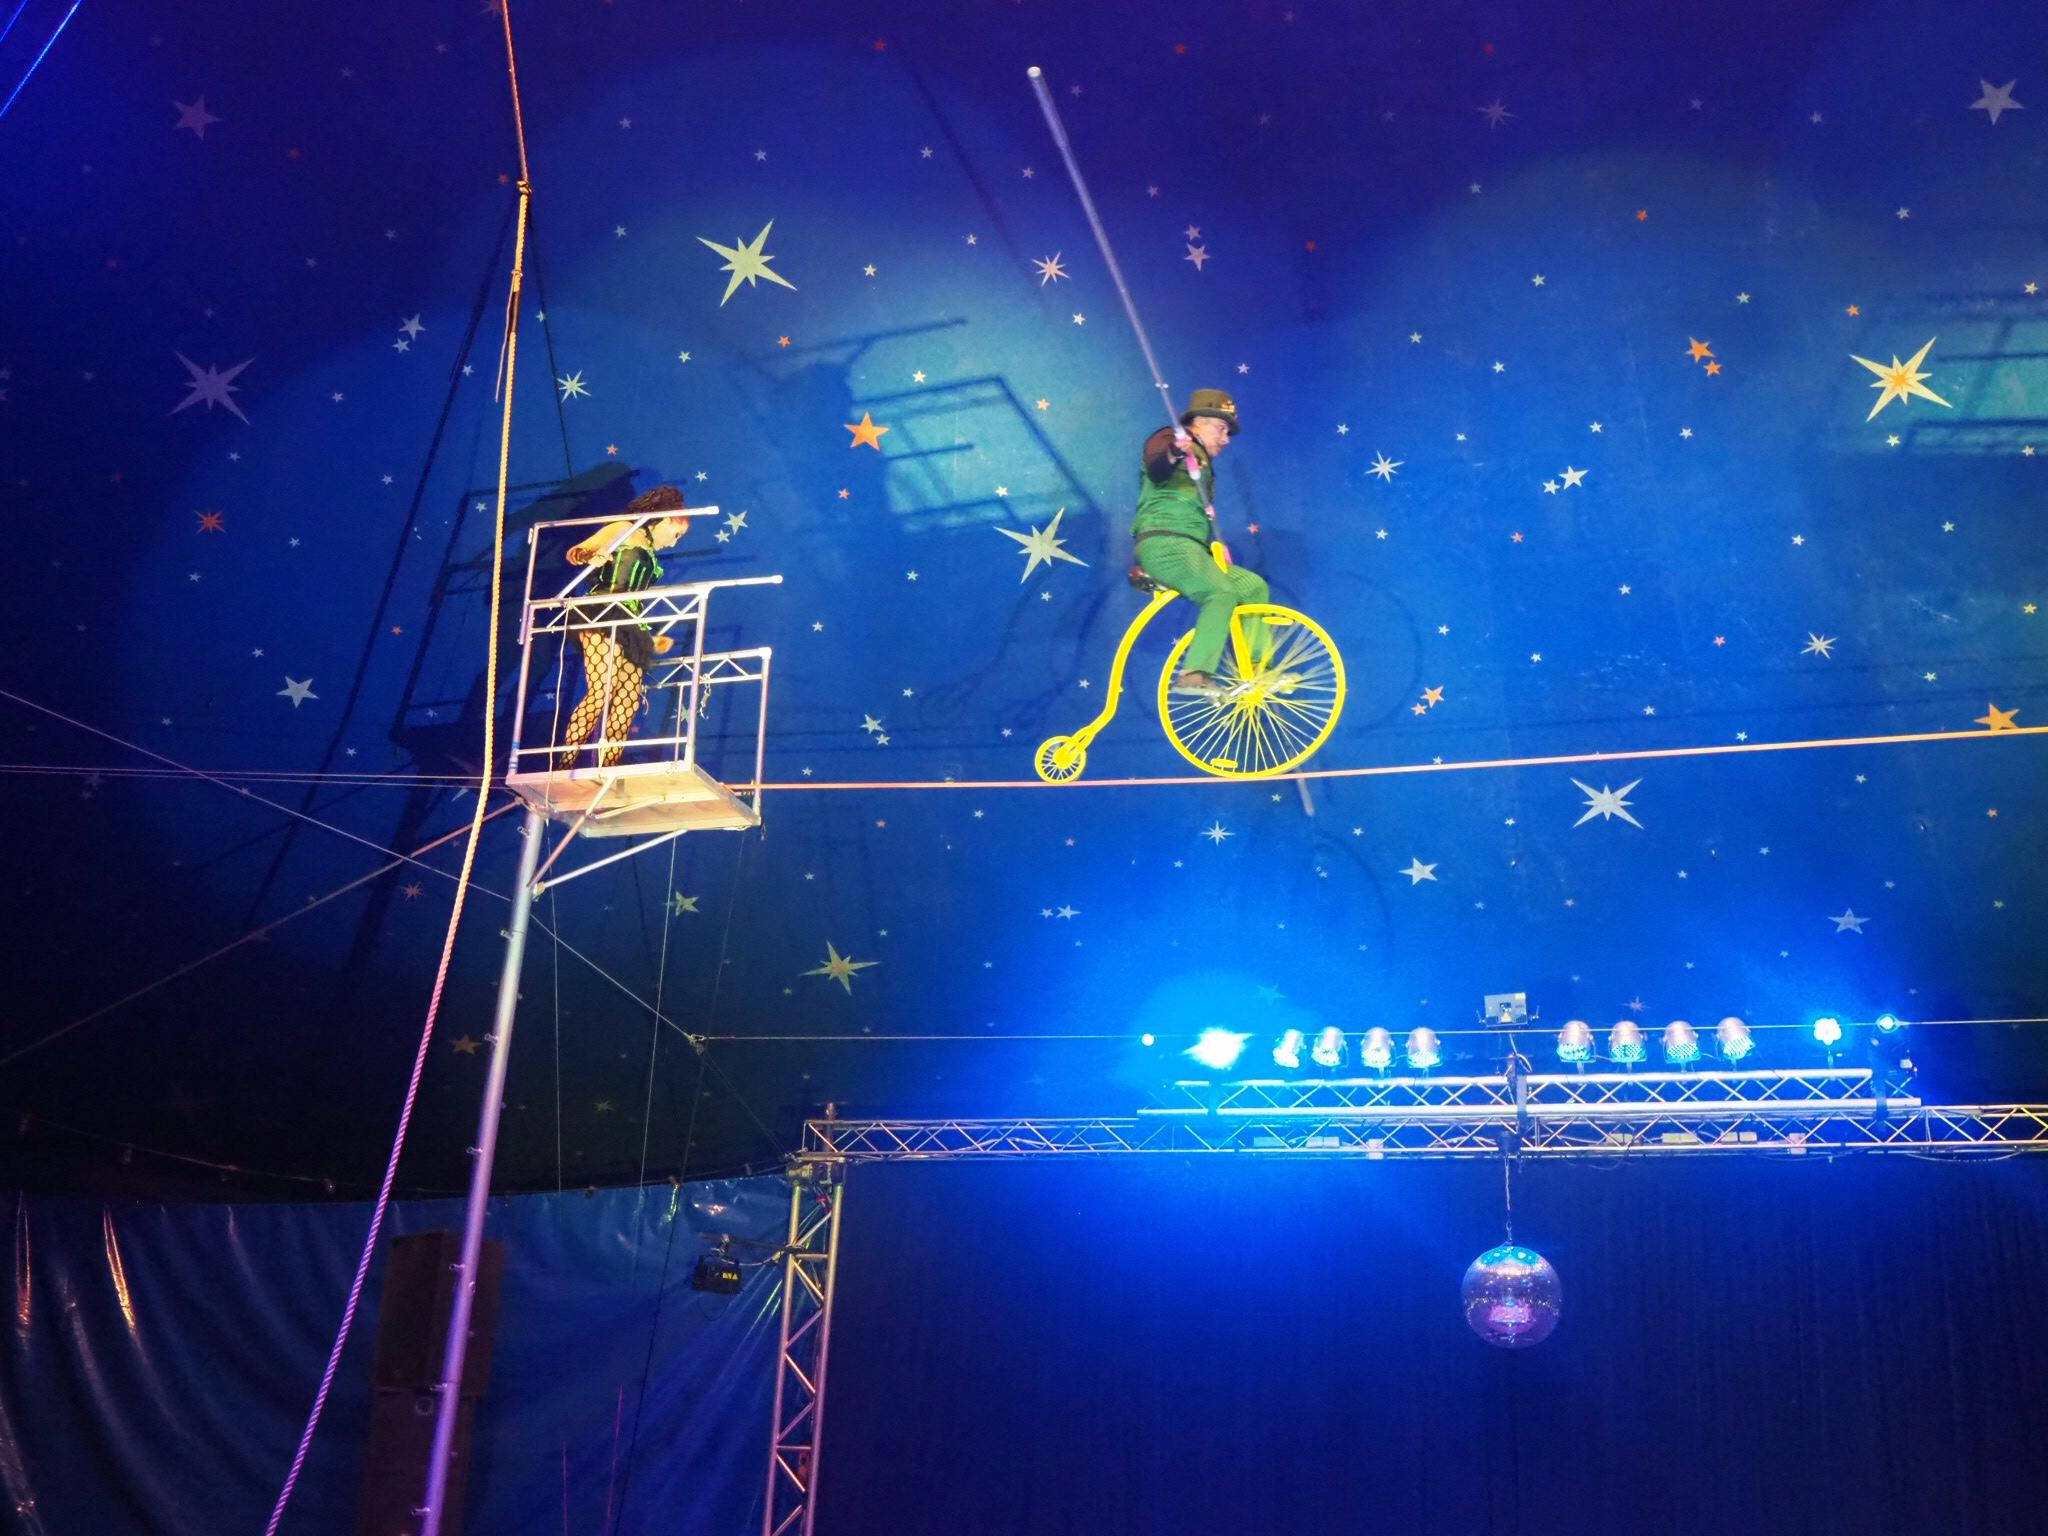 tight-rope act at the circus